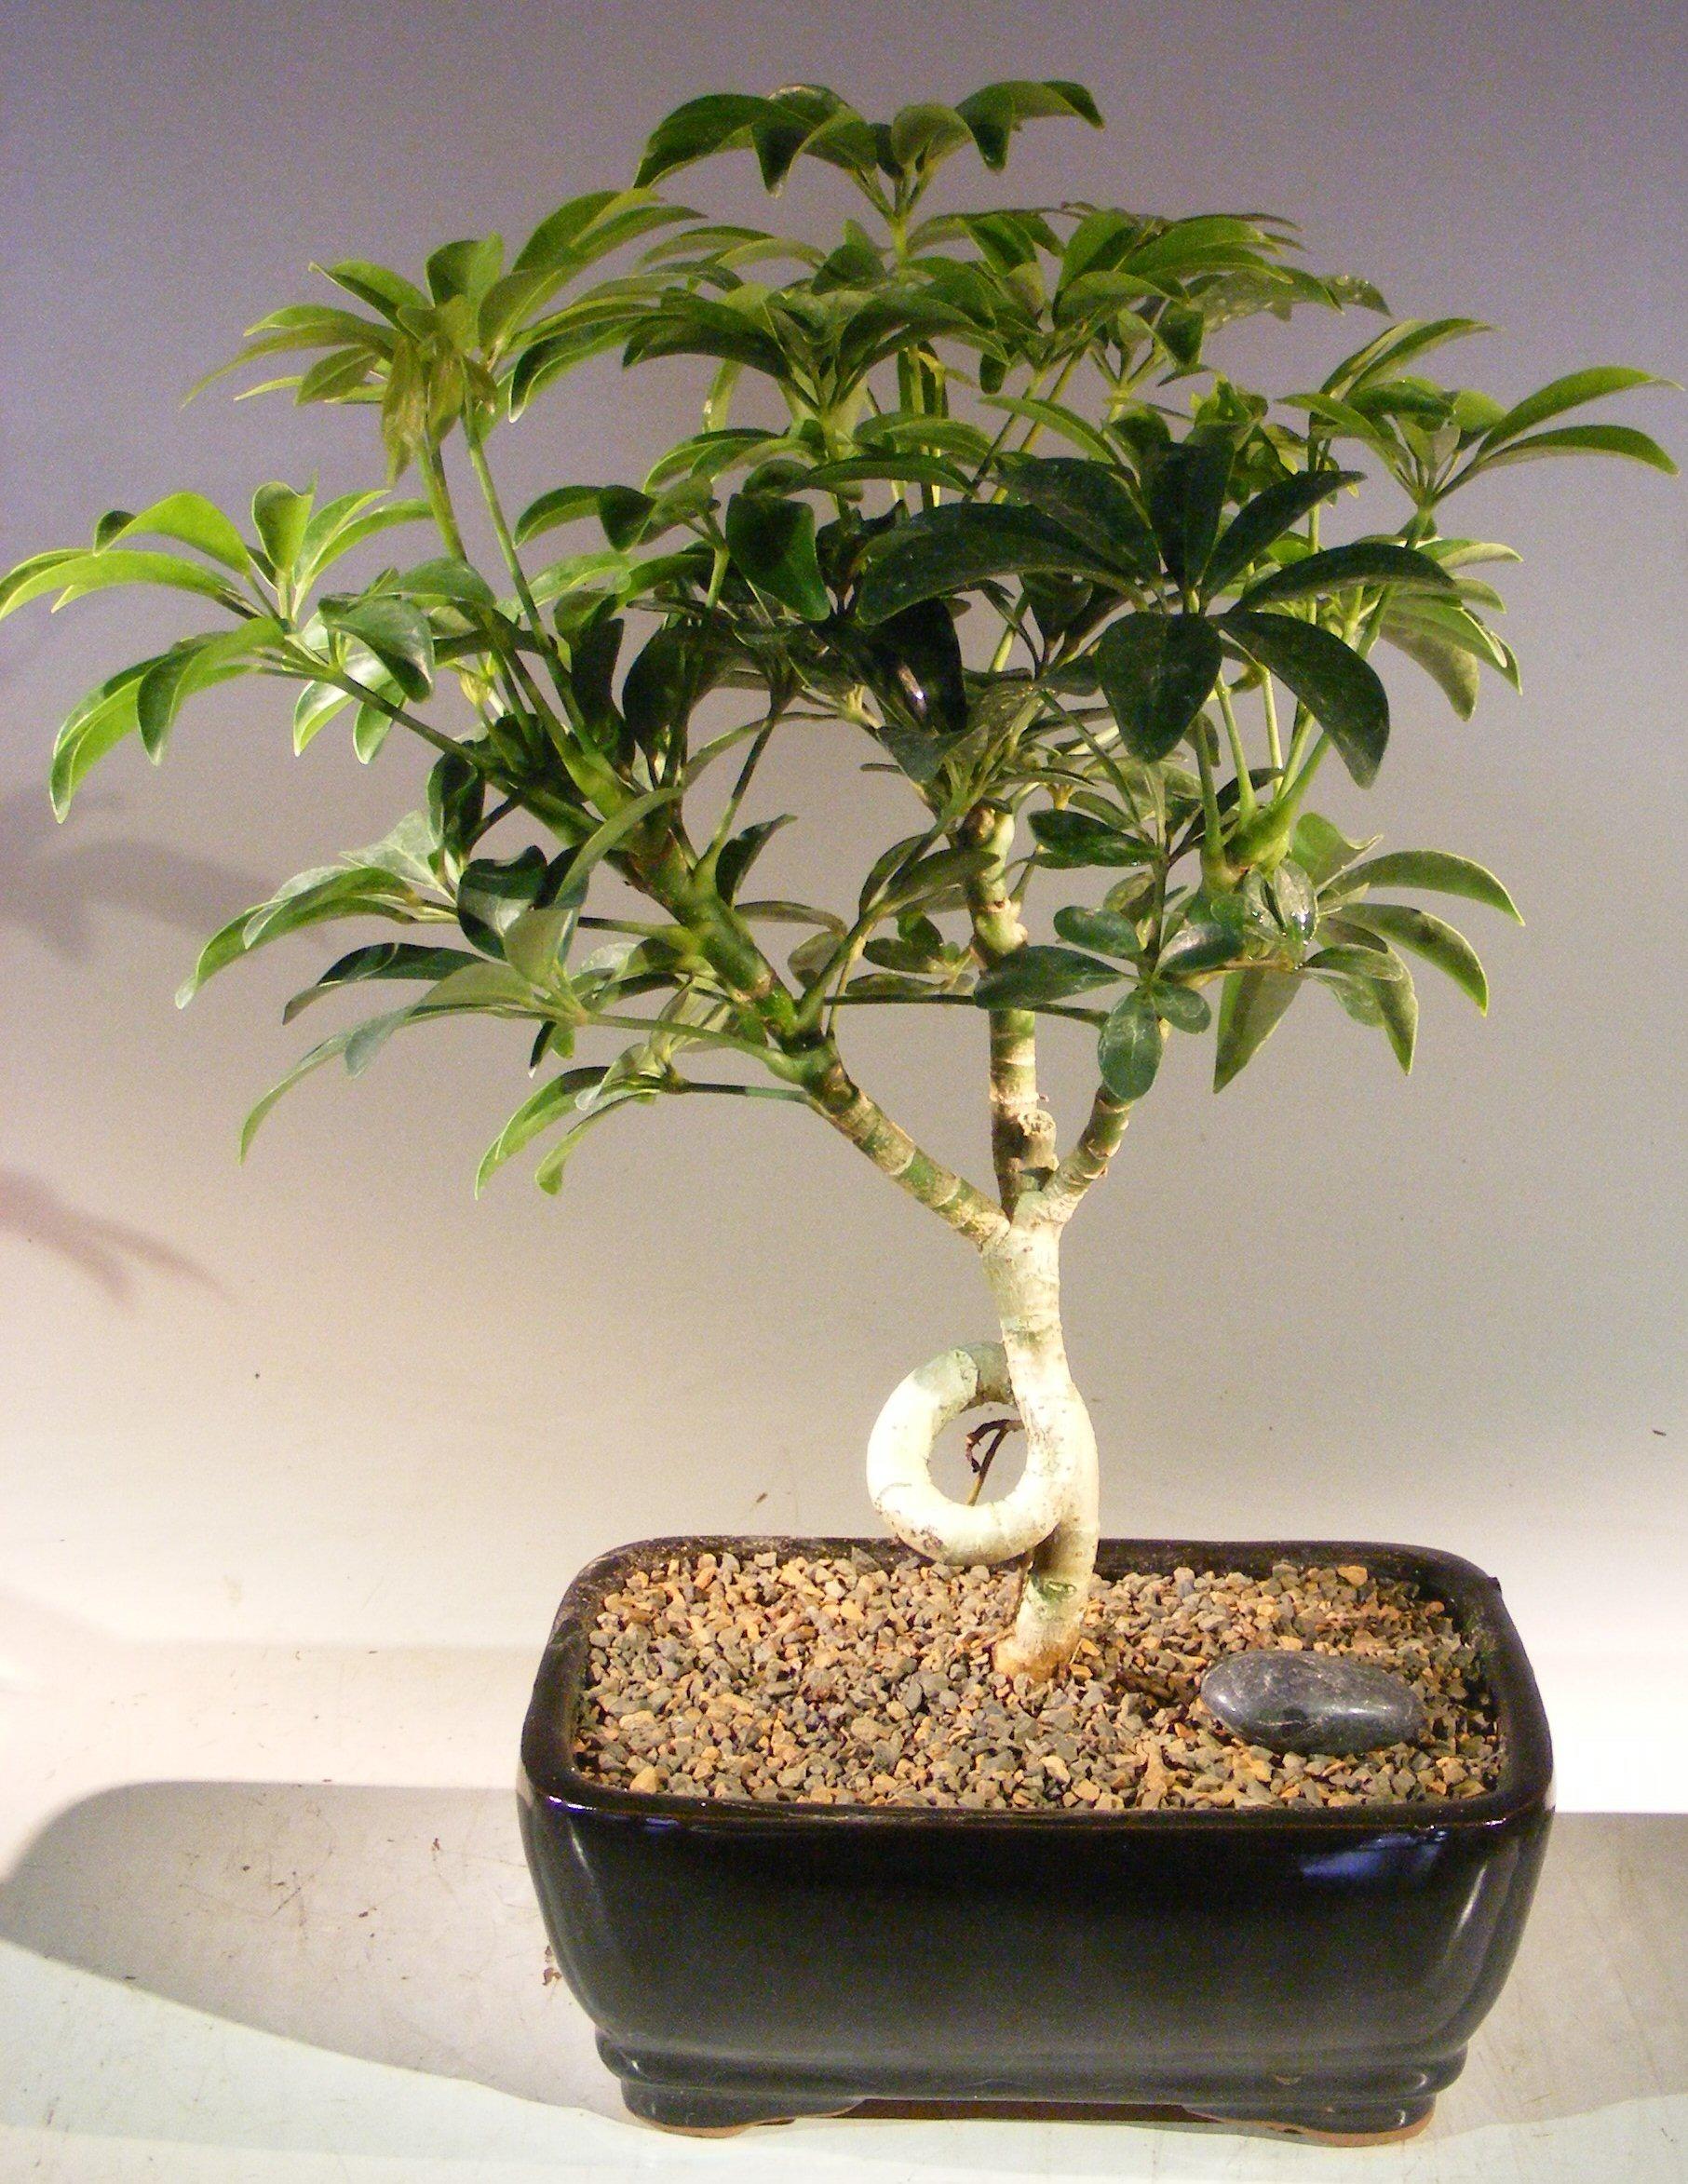 Hawaiian Umbrella Bonsai Tree - Medium Coiled Trunk Style (Arboricola Schefflera 'Luseanne') Image